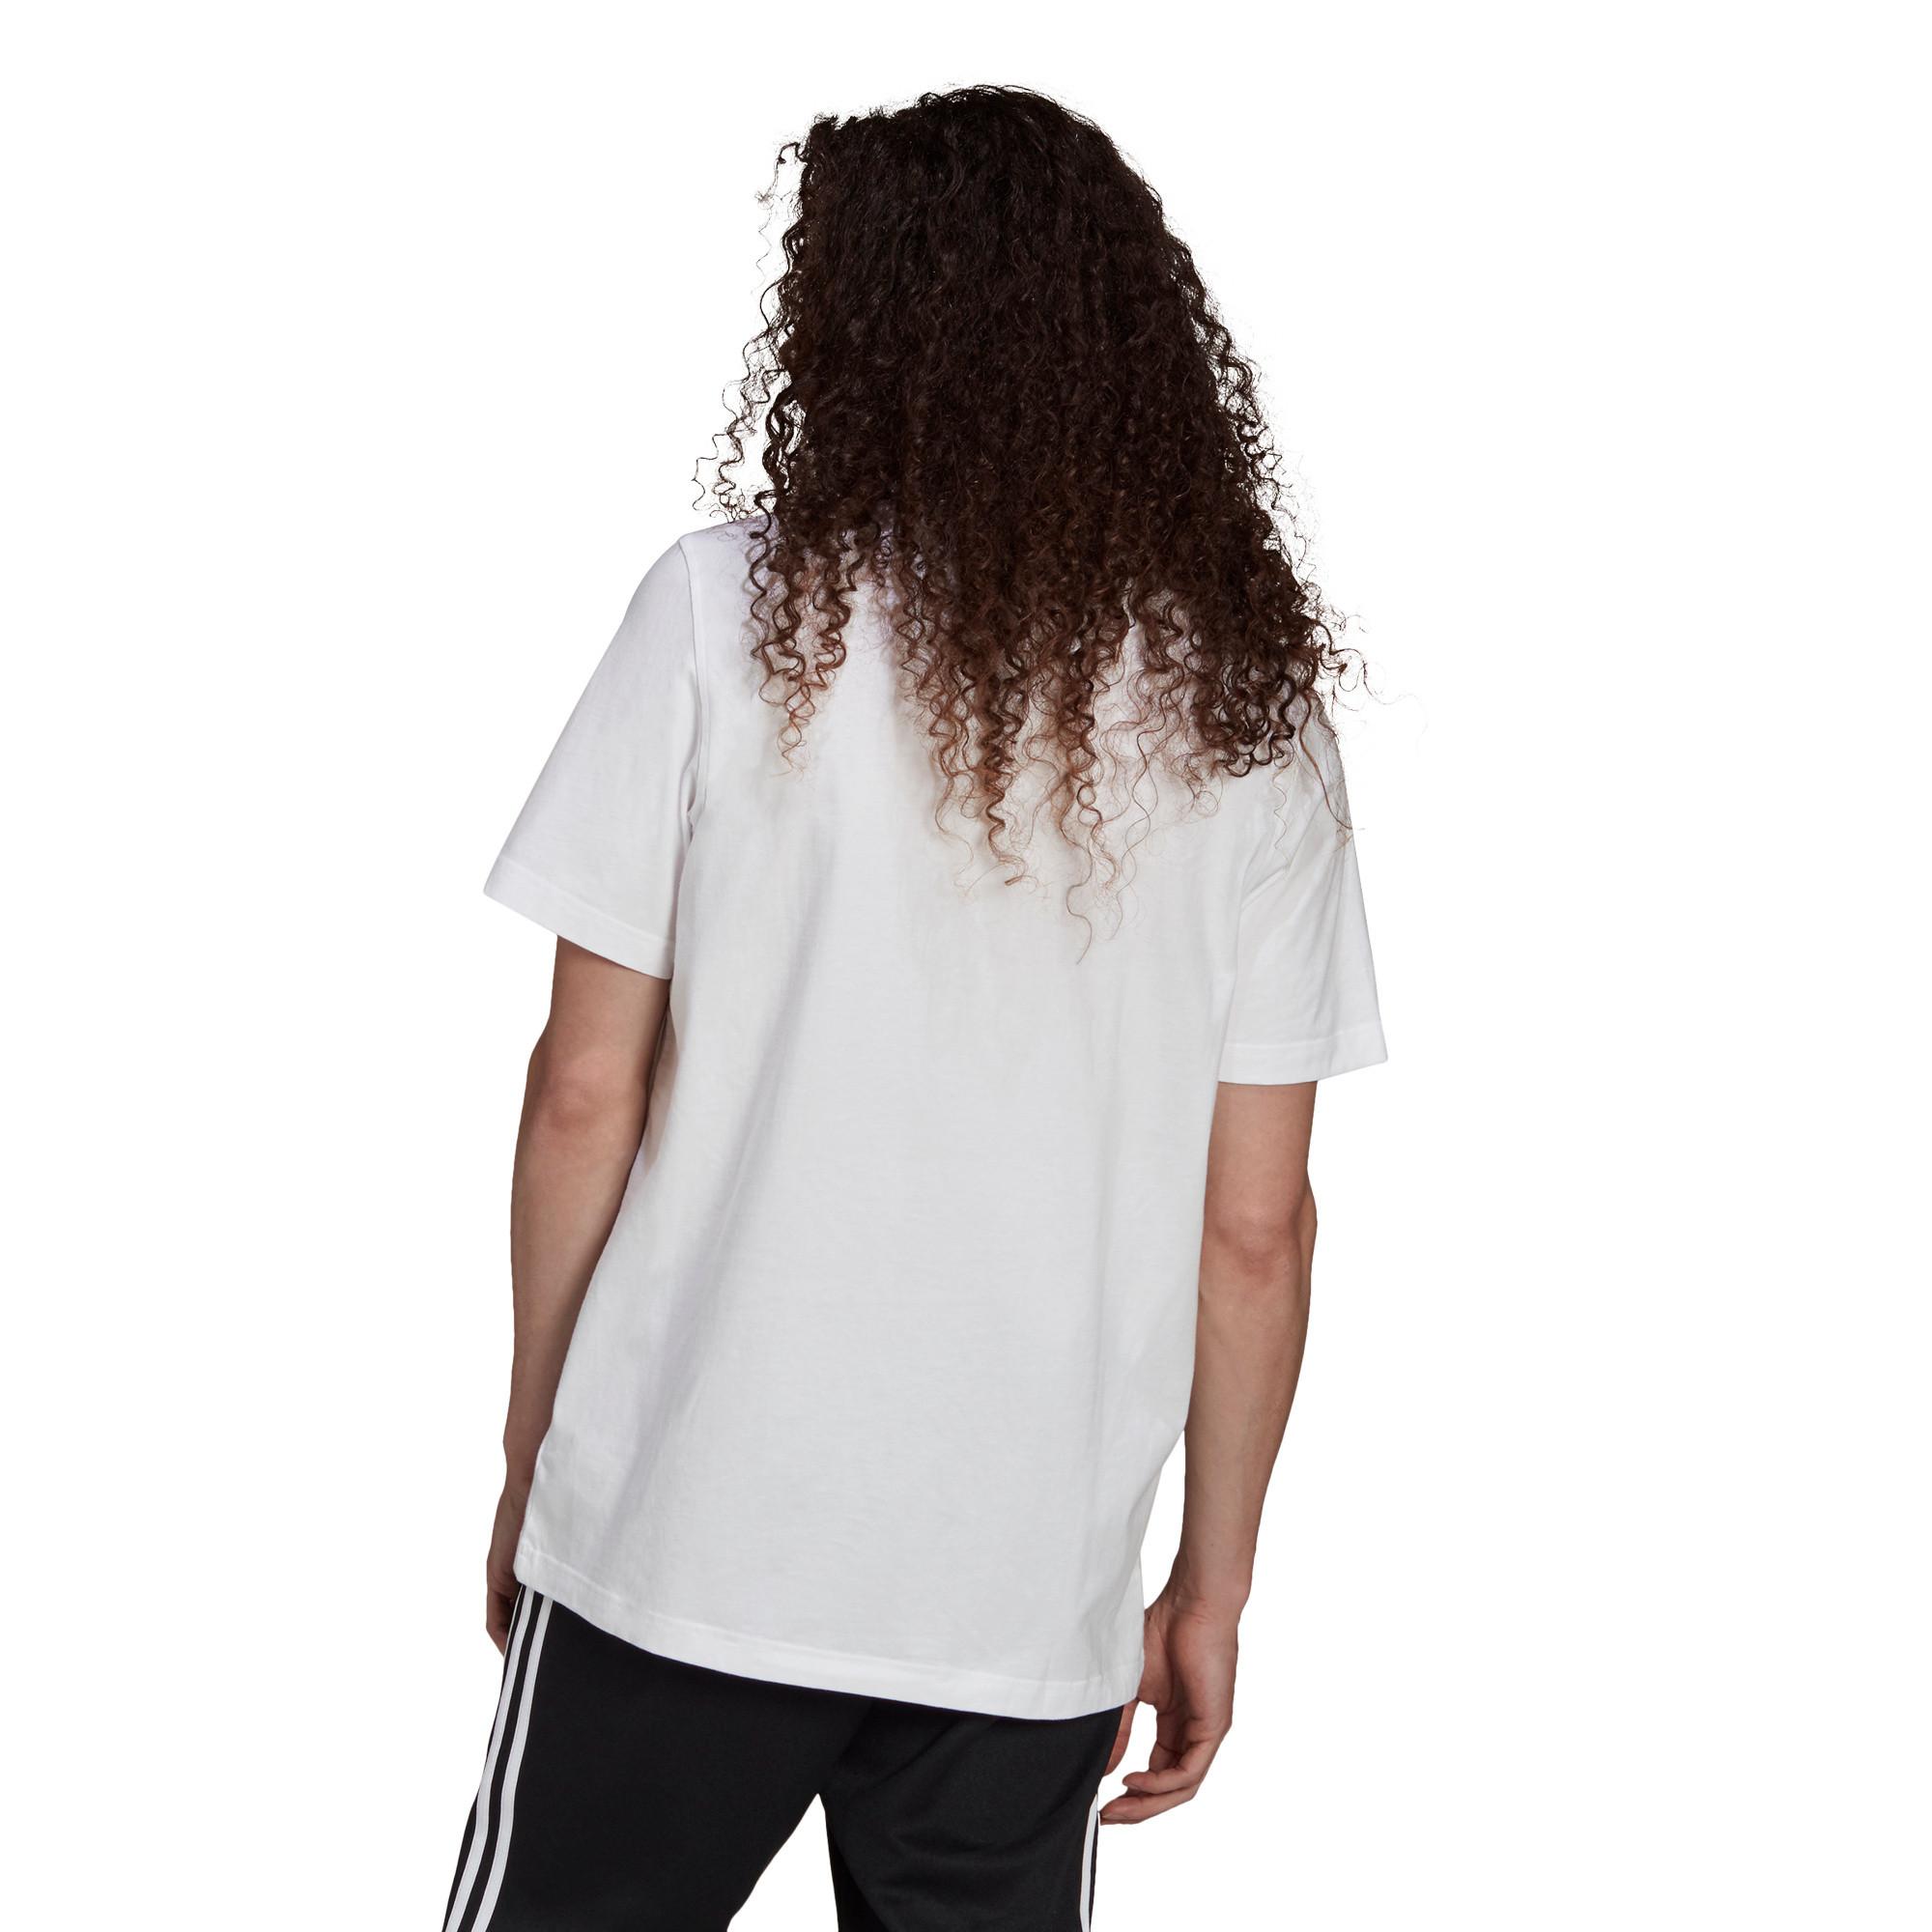 T-shirt uomo adicolor Classics Trefoil, Bianco/Nero, large image number 2